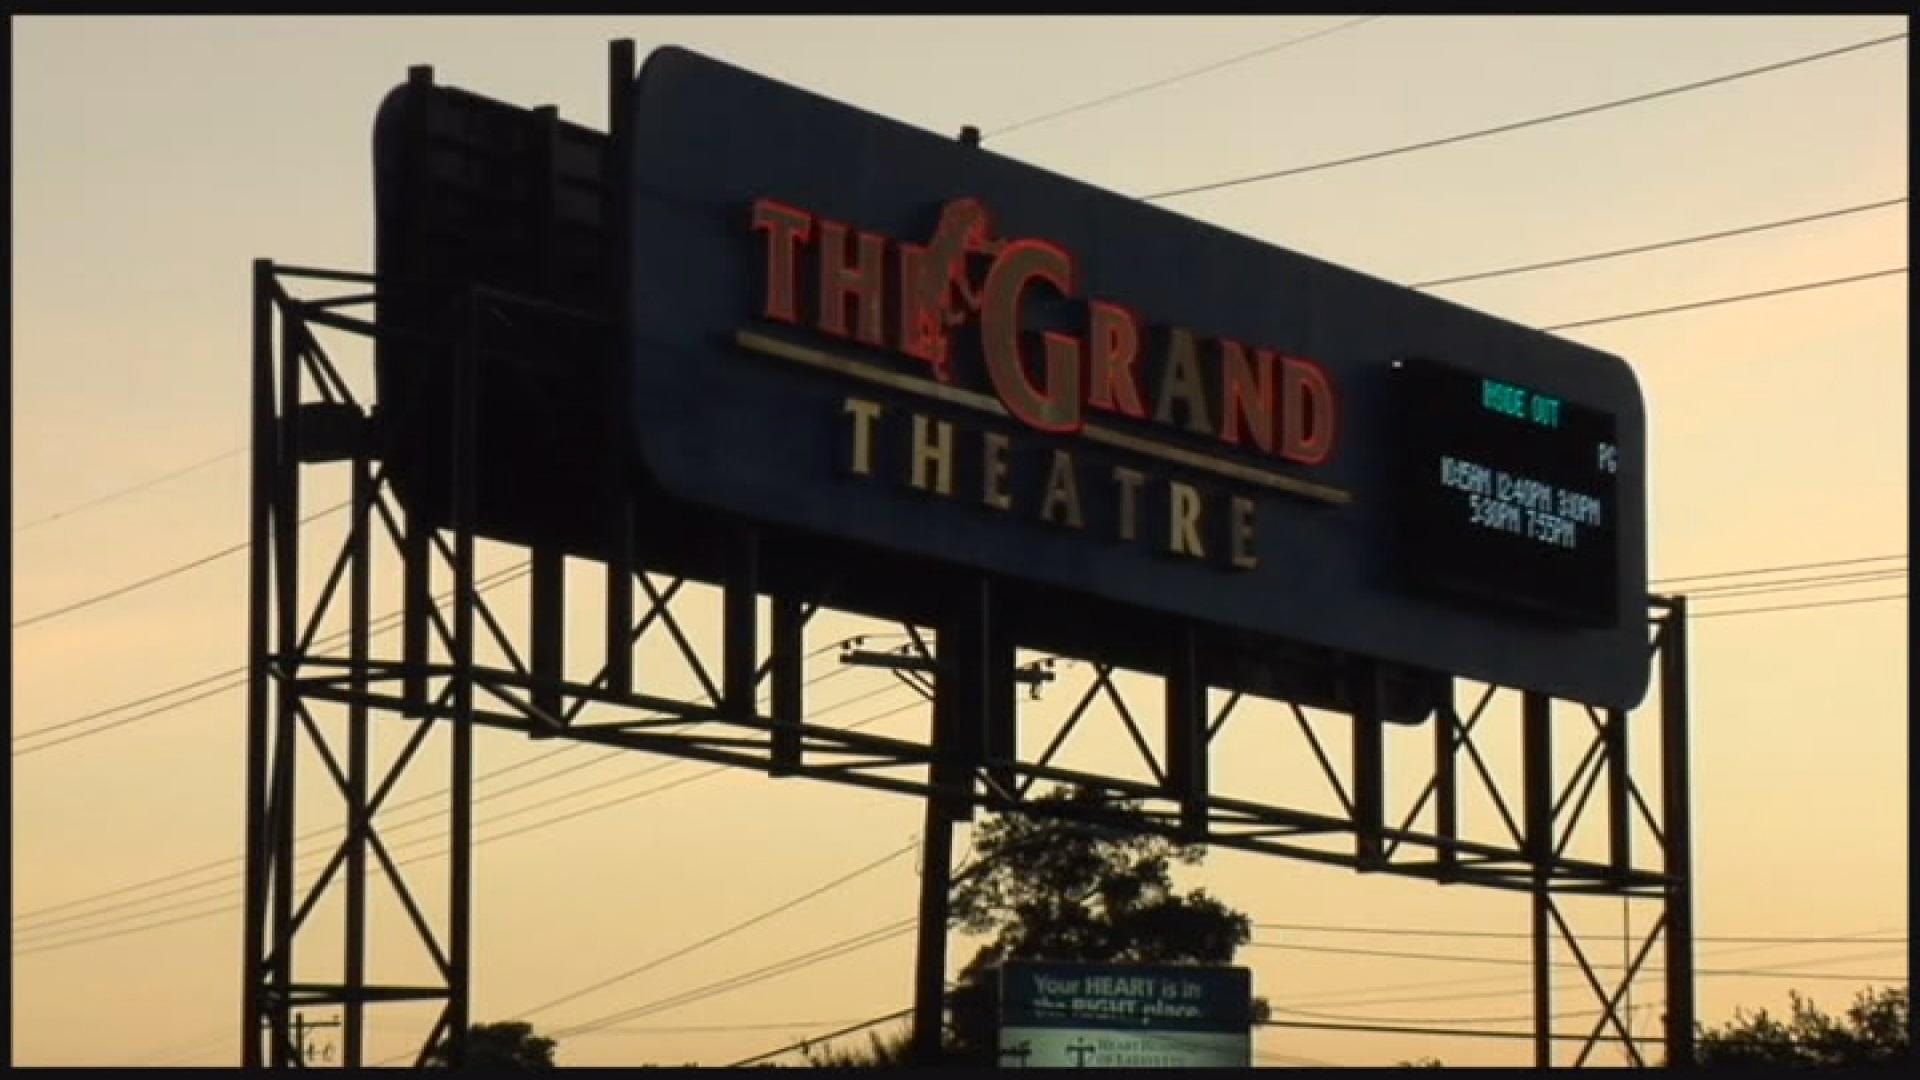 Grand Theater_1438119956262.jpg